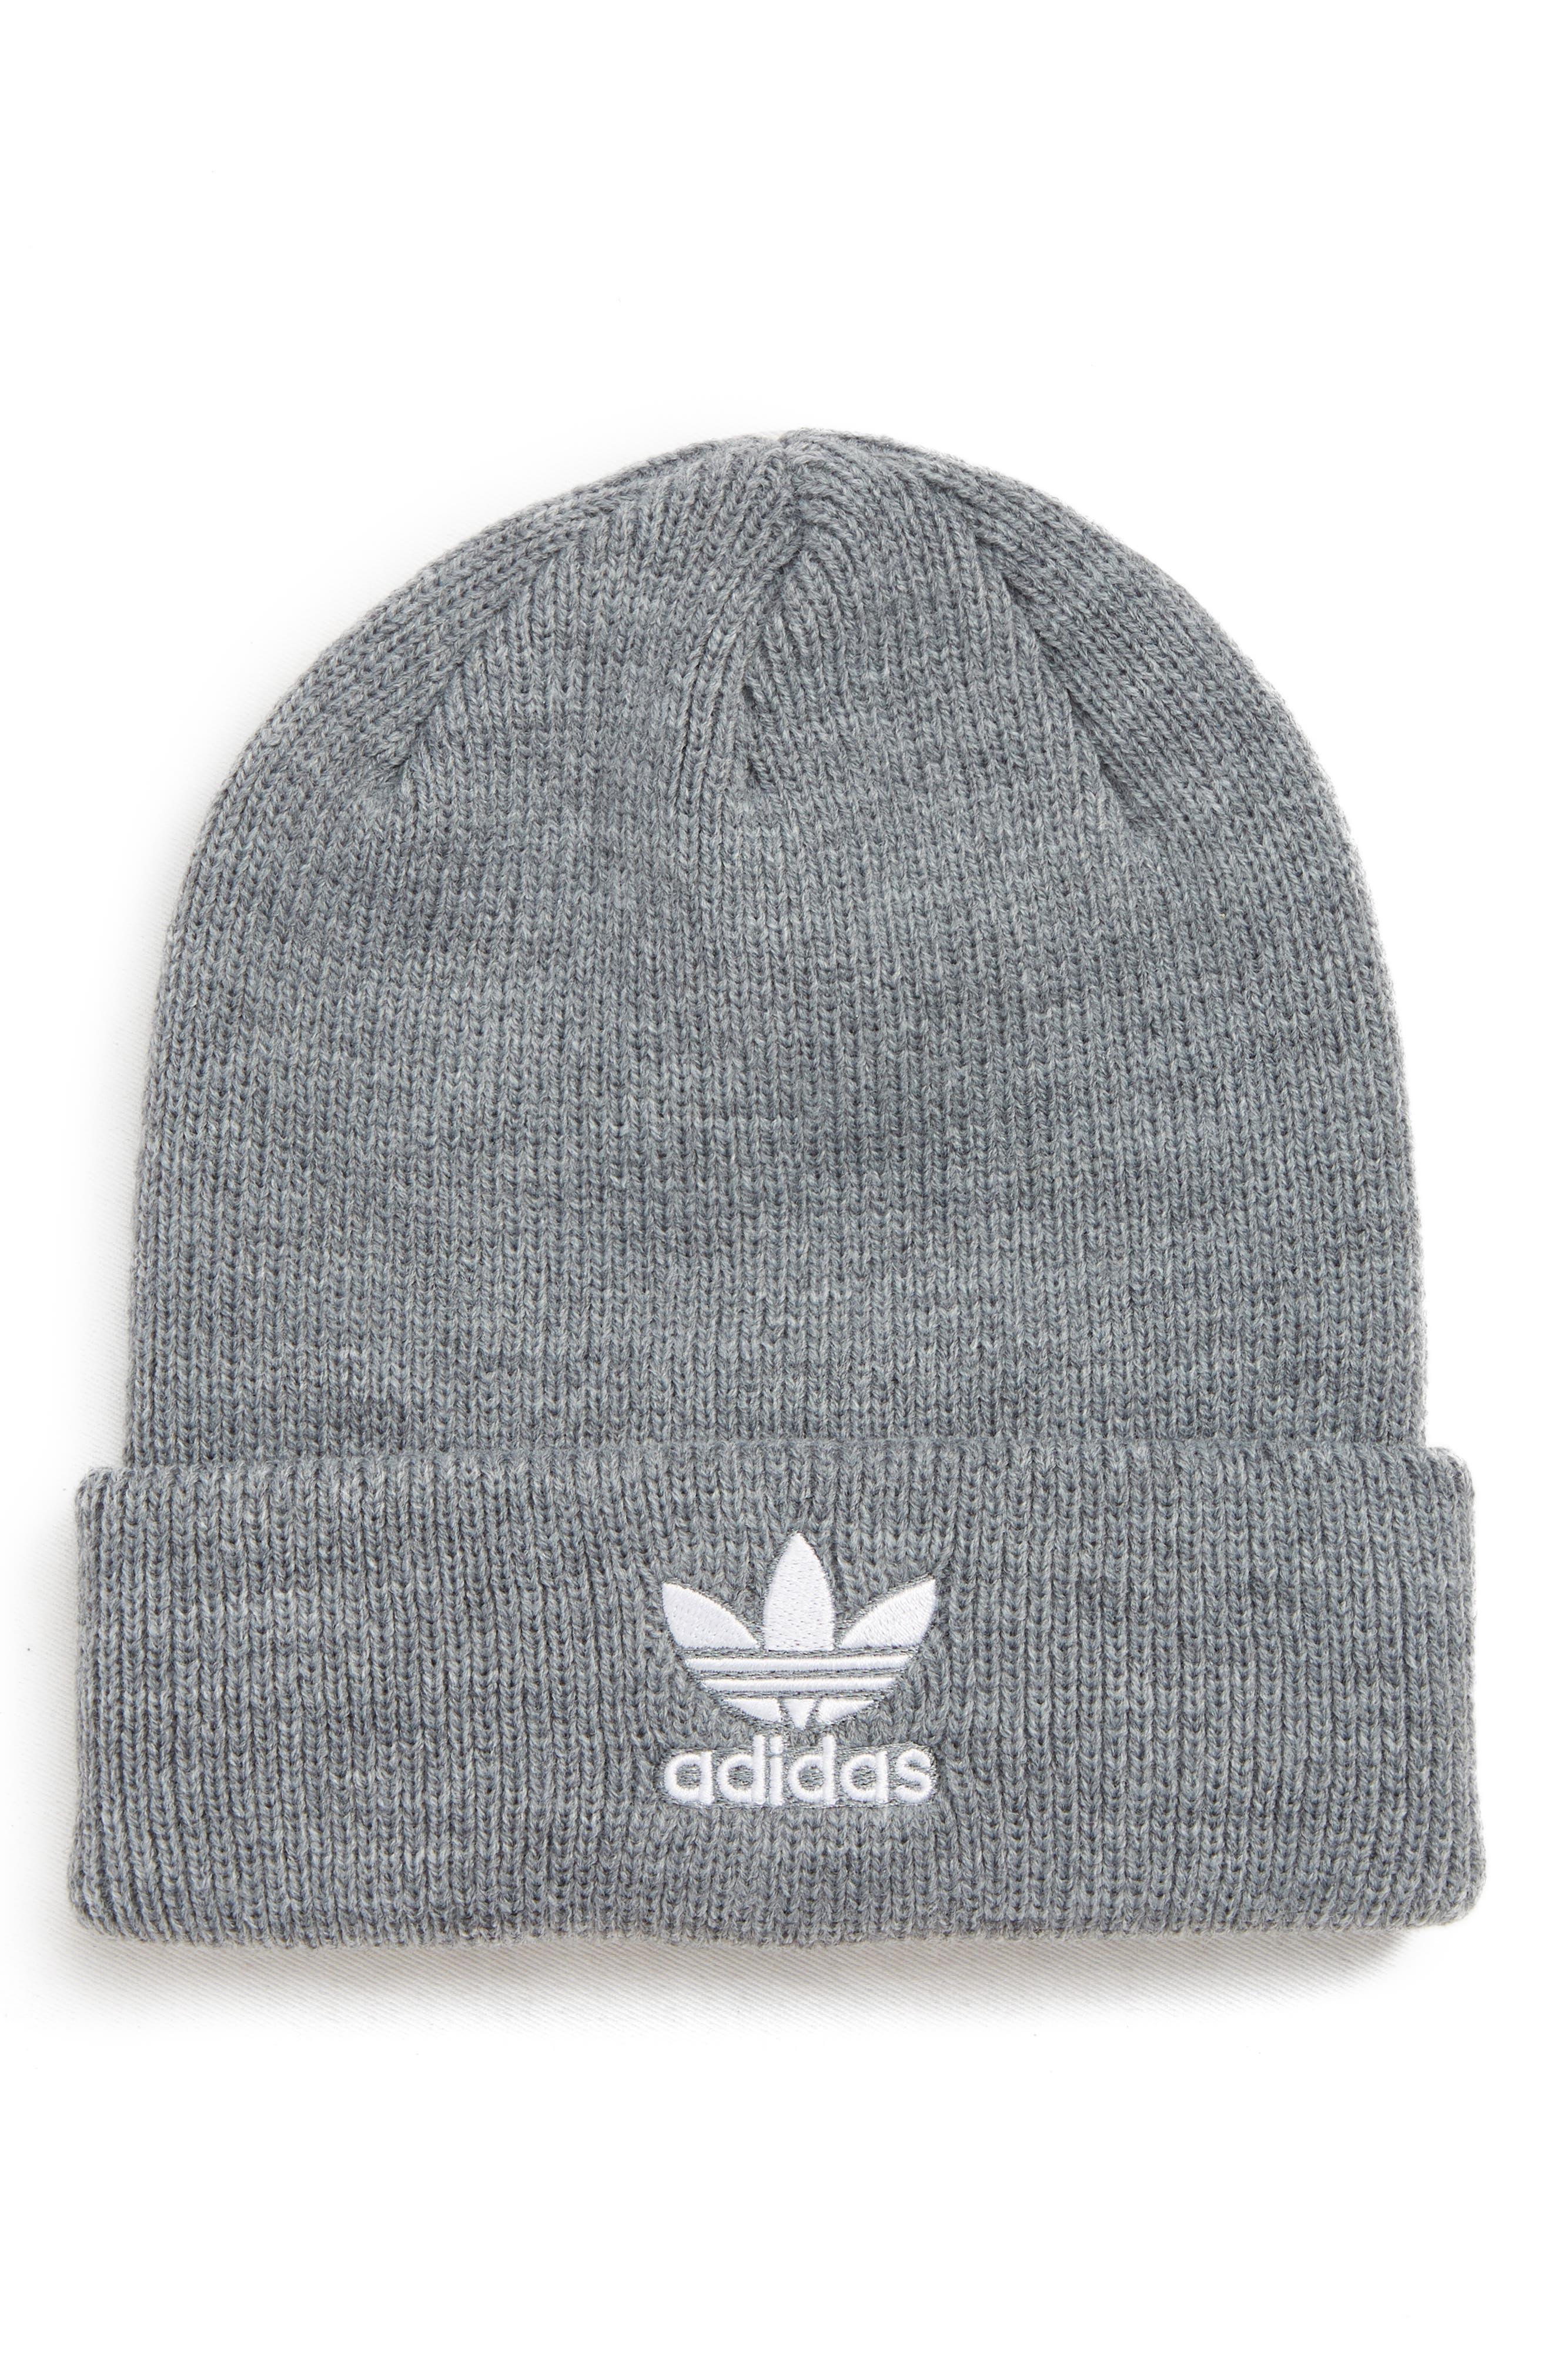 Girls Adidas Embroidered Trefoil Beanie